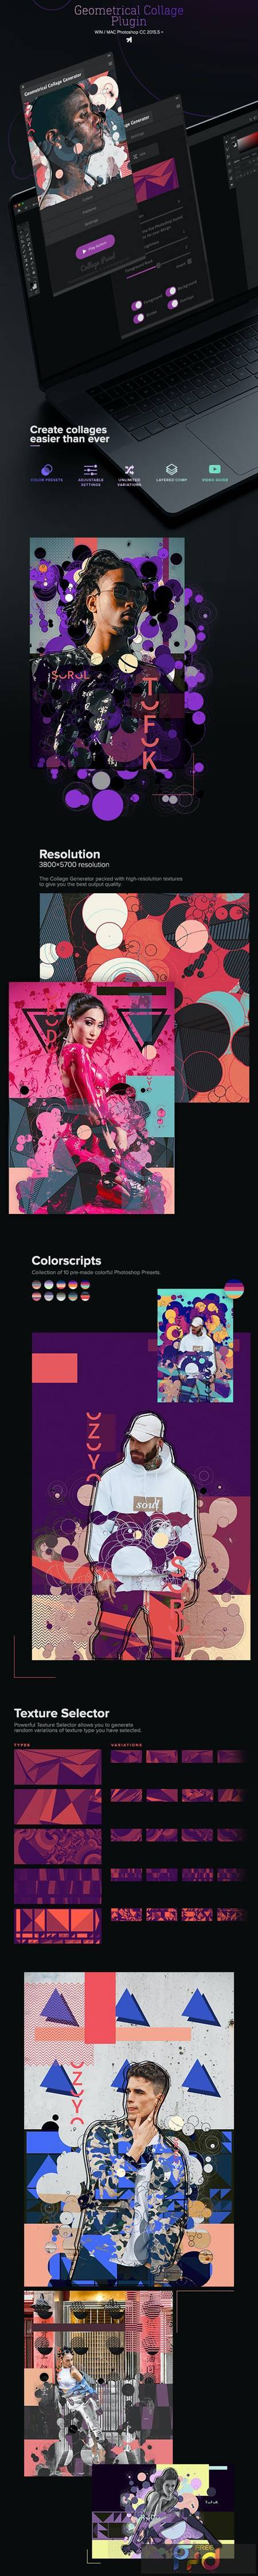 Geometrical Collage Generator - Photoshop Plugin 26668737 1